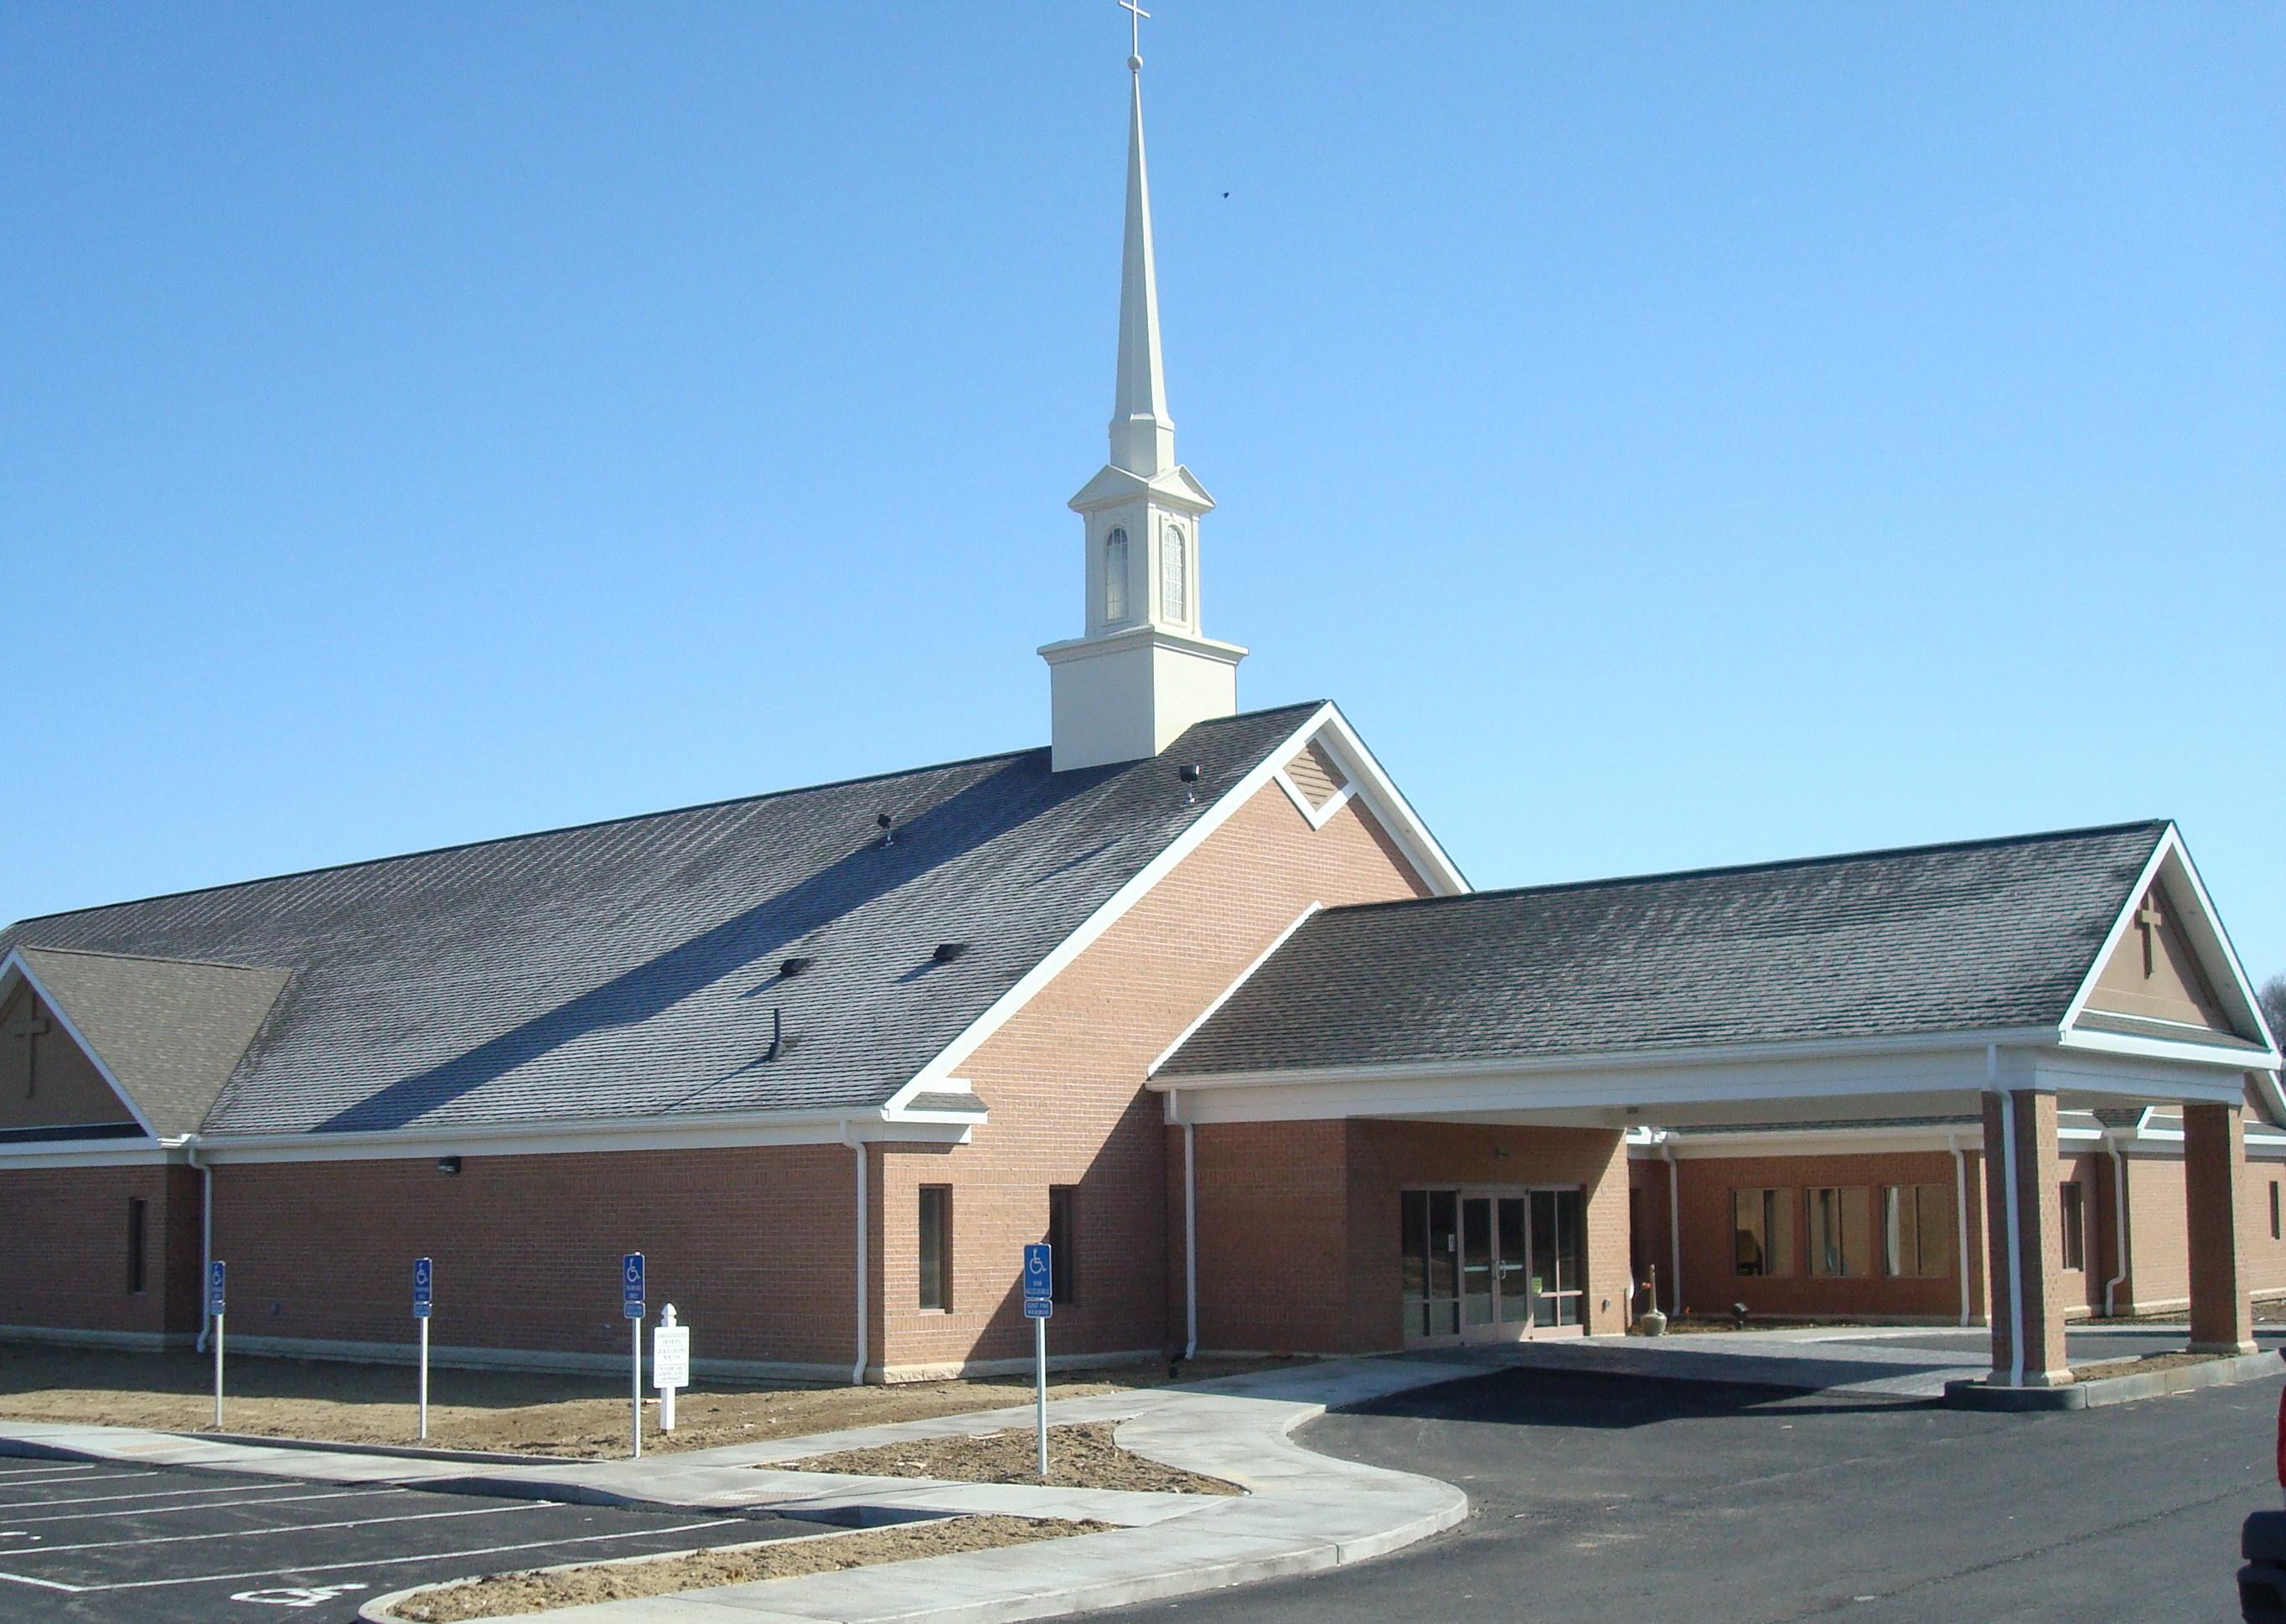 https://0201.nccdn.net/1_2/000/000/156/8be/grace-chapel--2-.jpg